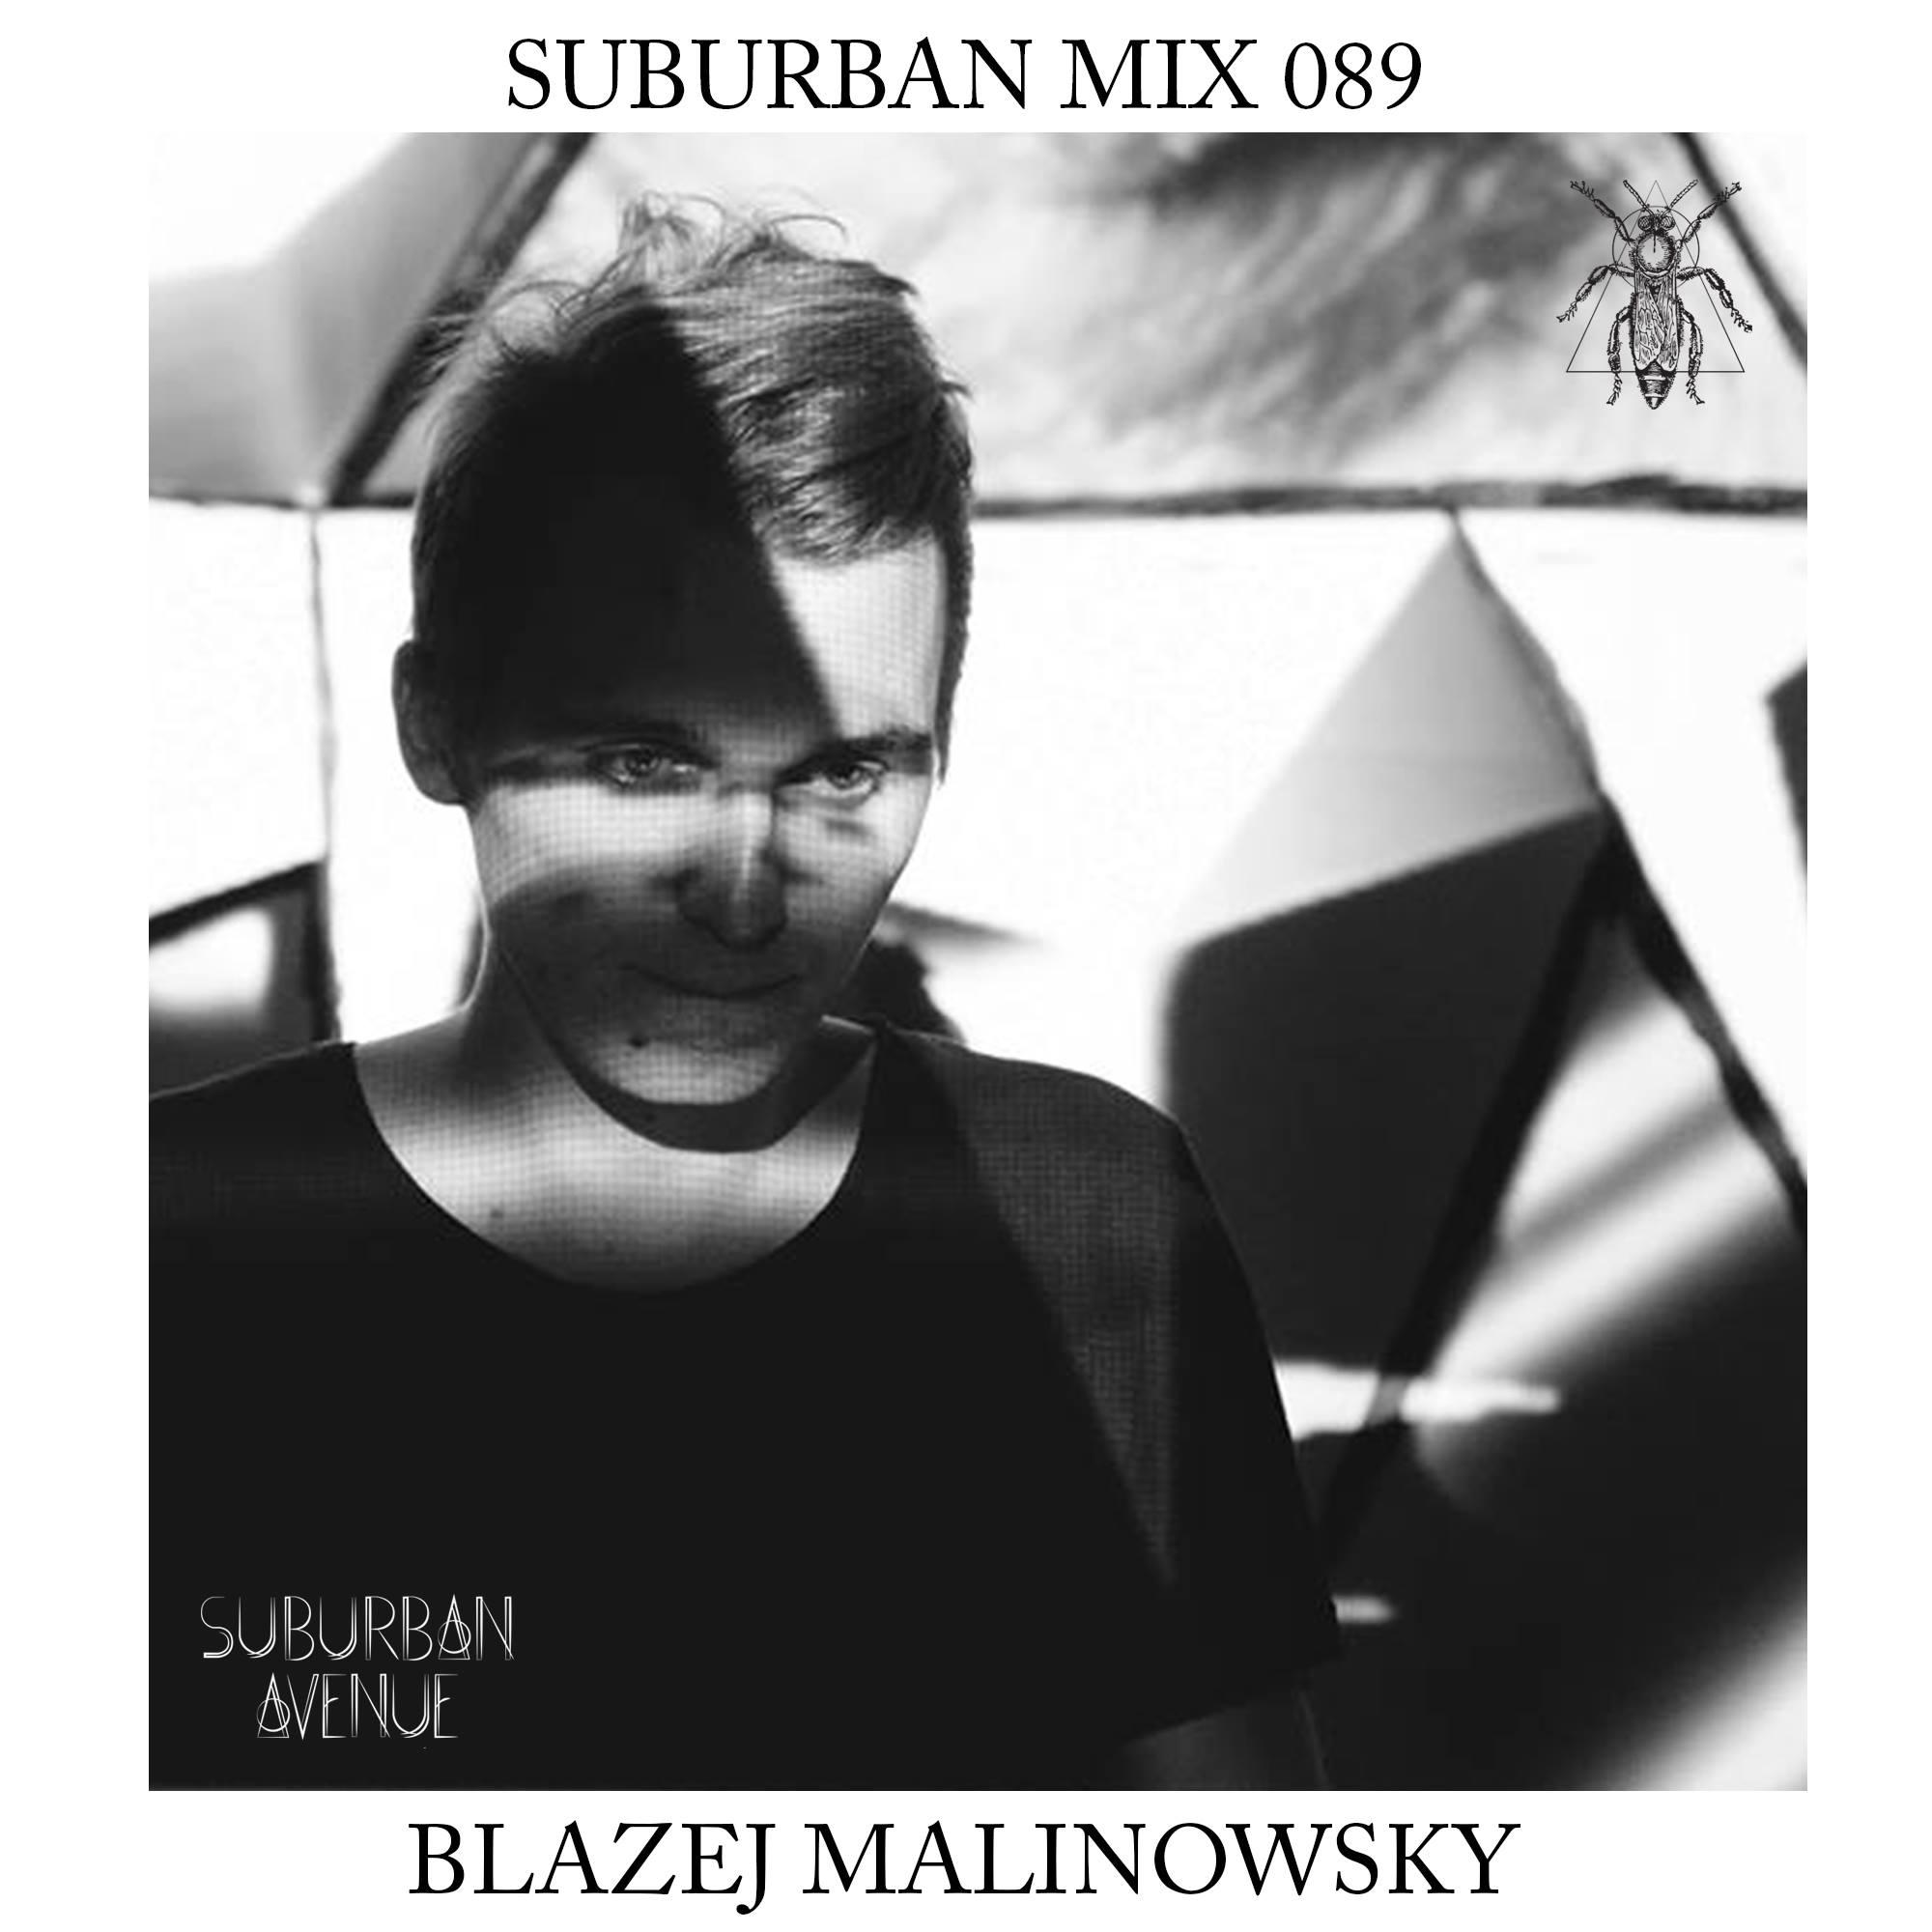 Suburban Mix 089 - Blazej Malinowski